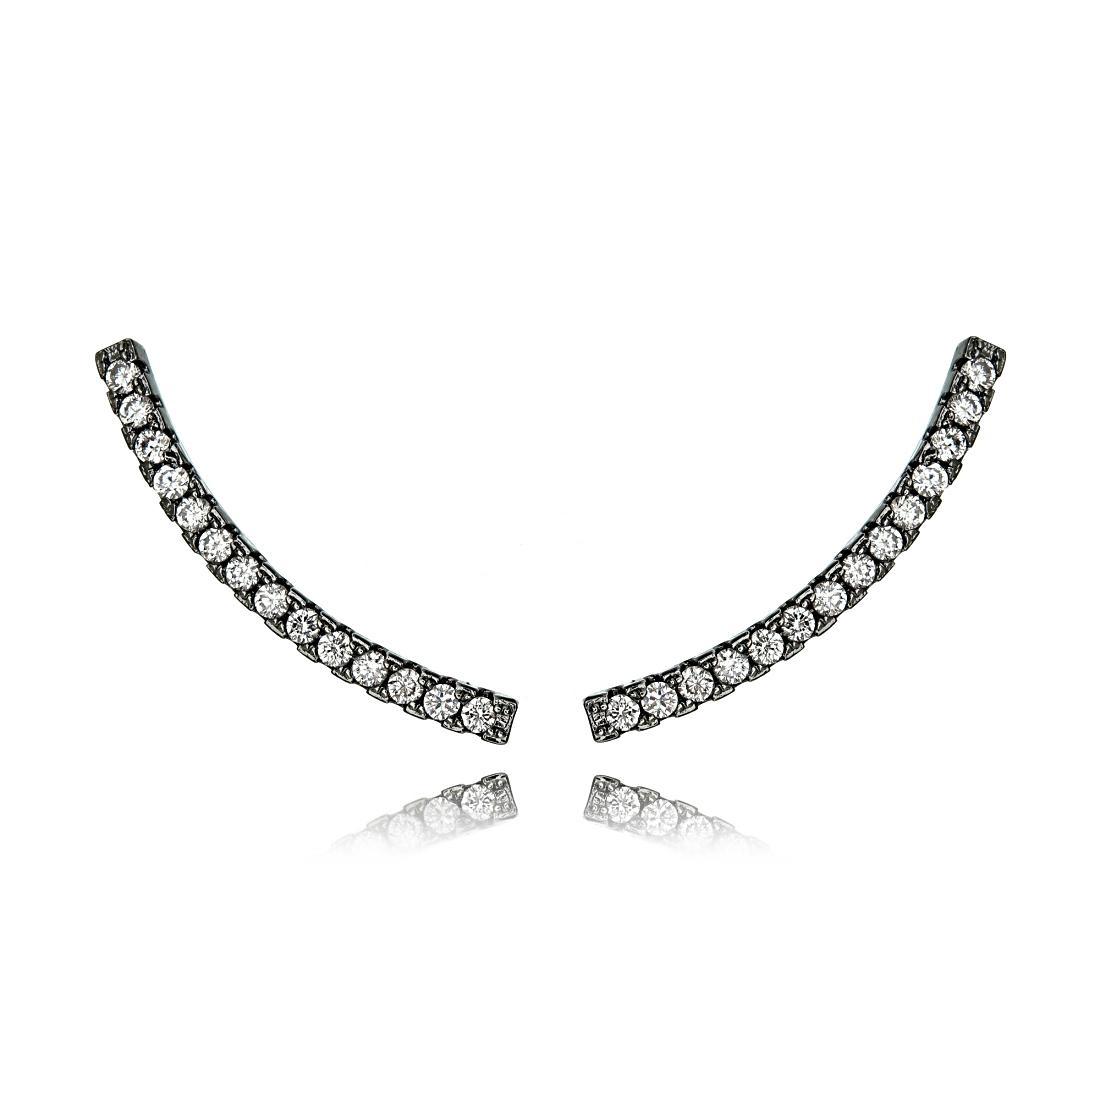 Ear Cuff Linha Zircônia Cristal Semijoia Fashion Ródio Negro  - Soloyou